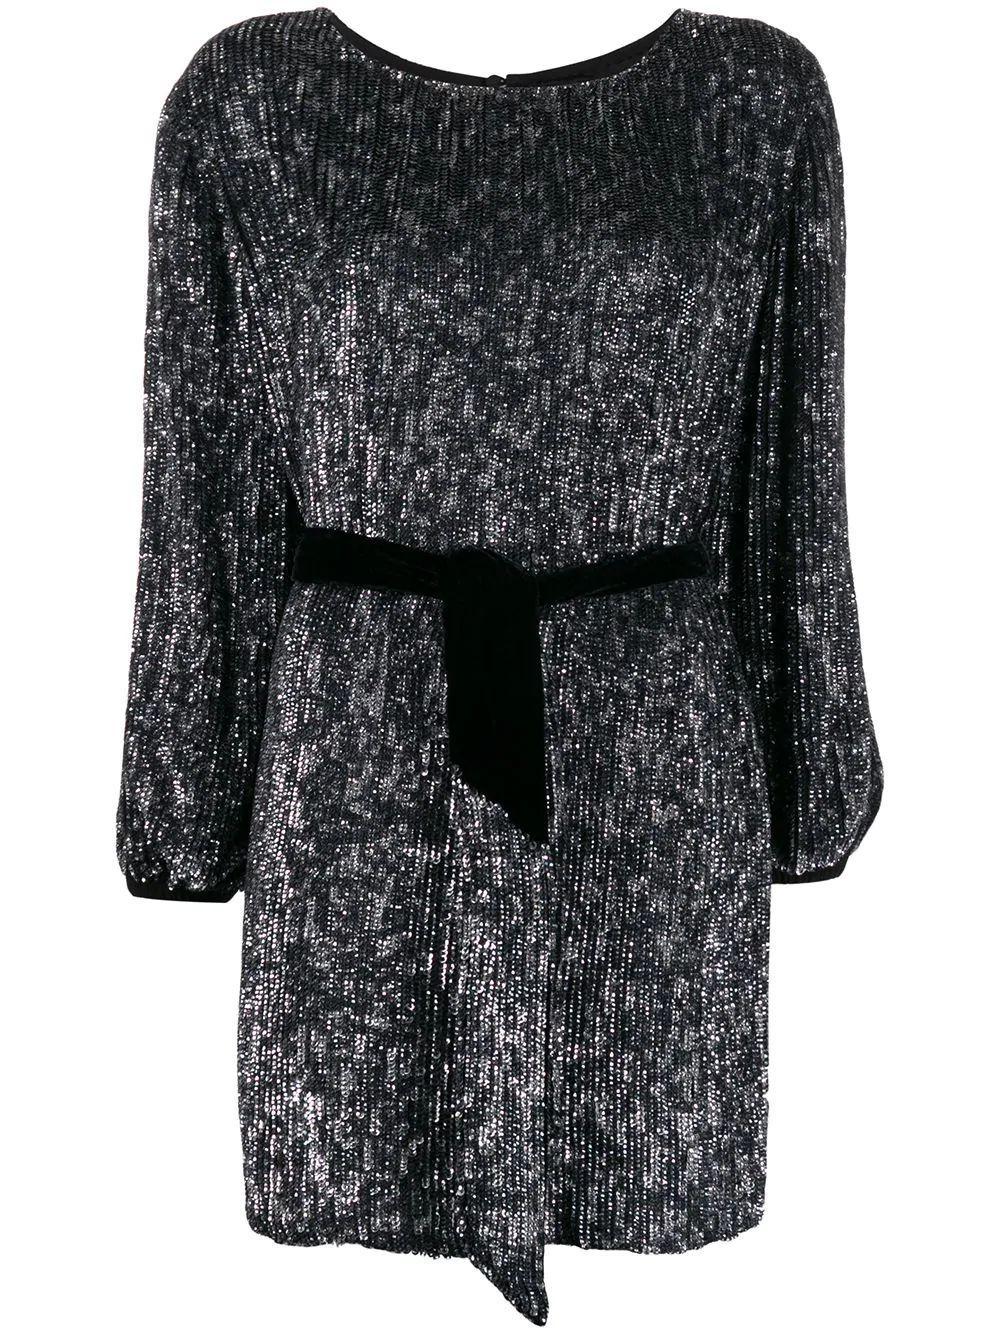 Grace Long Sleeve Bateau Neck Mini Dress With Belt Item # FW19-2308